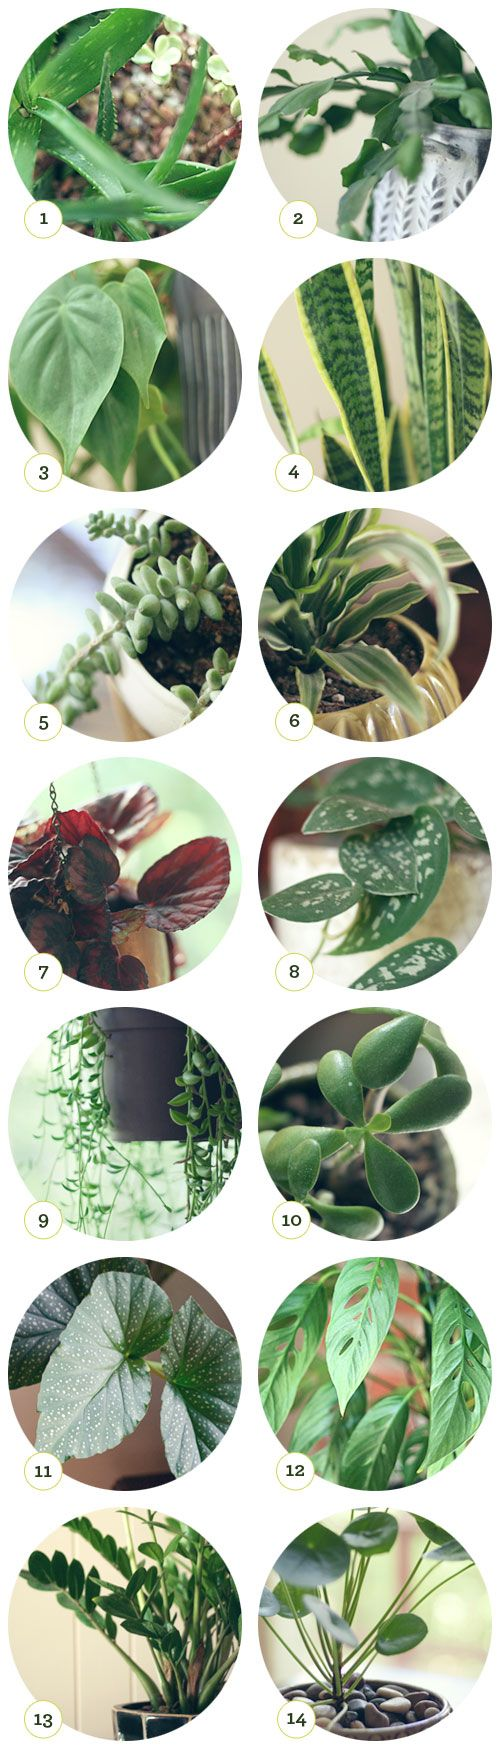 House plant identification green thumb pinterest plants house